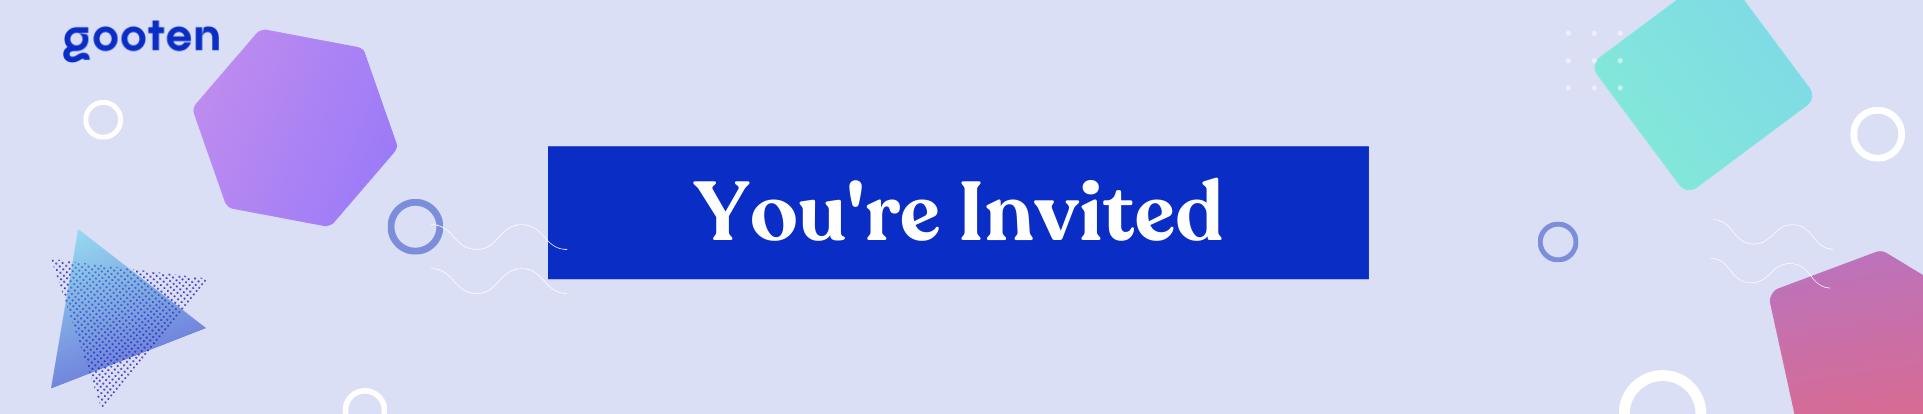 Youre Invited Hero Img